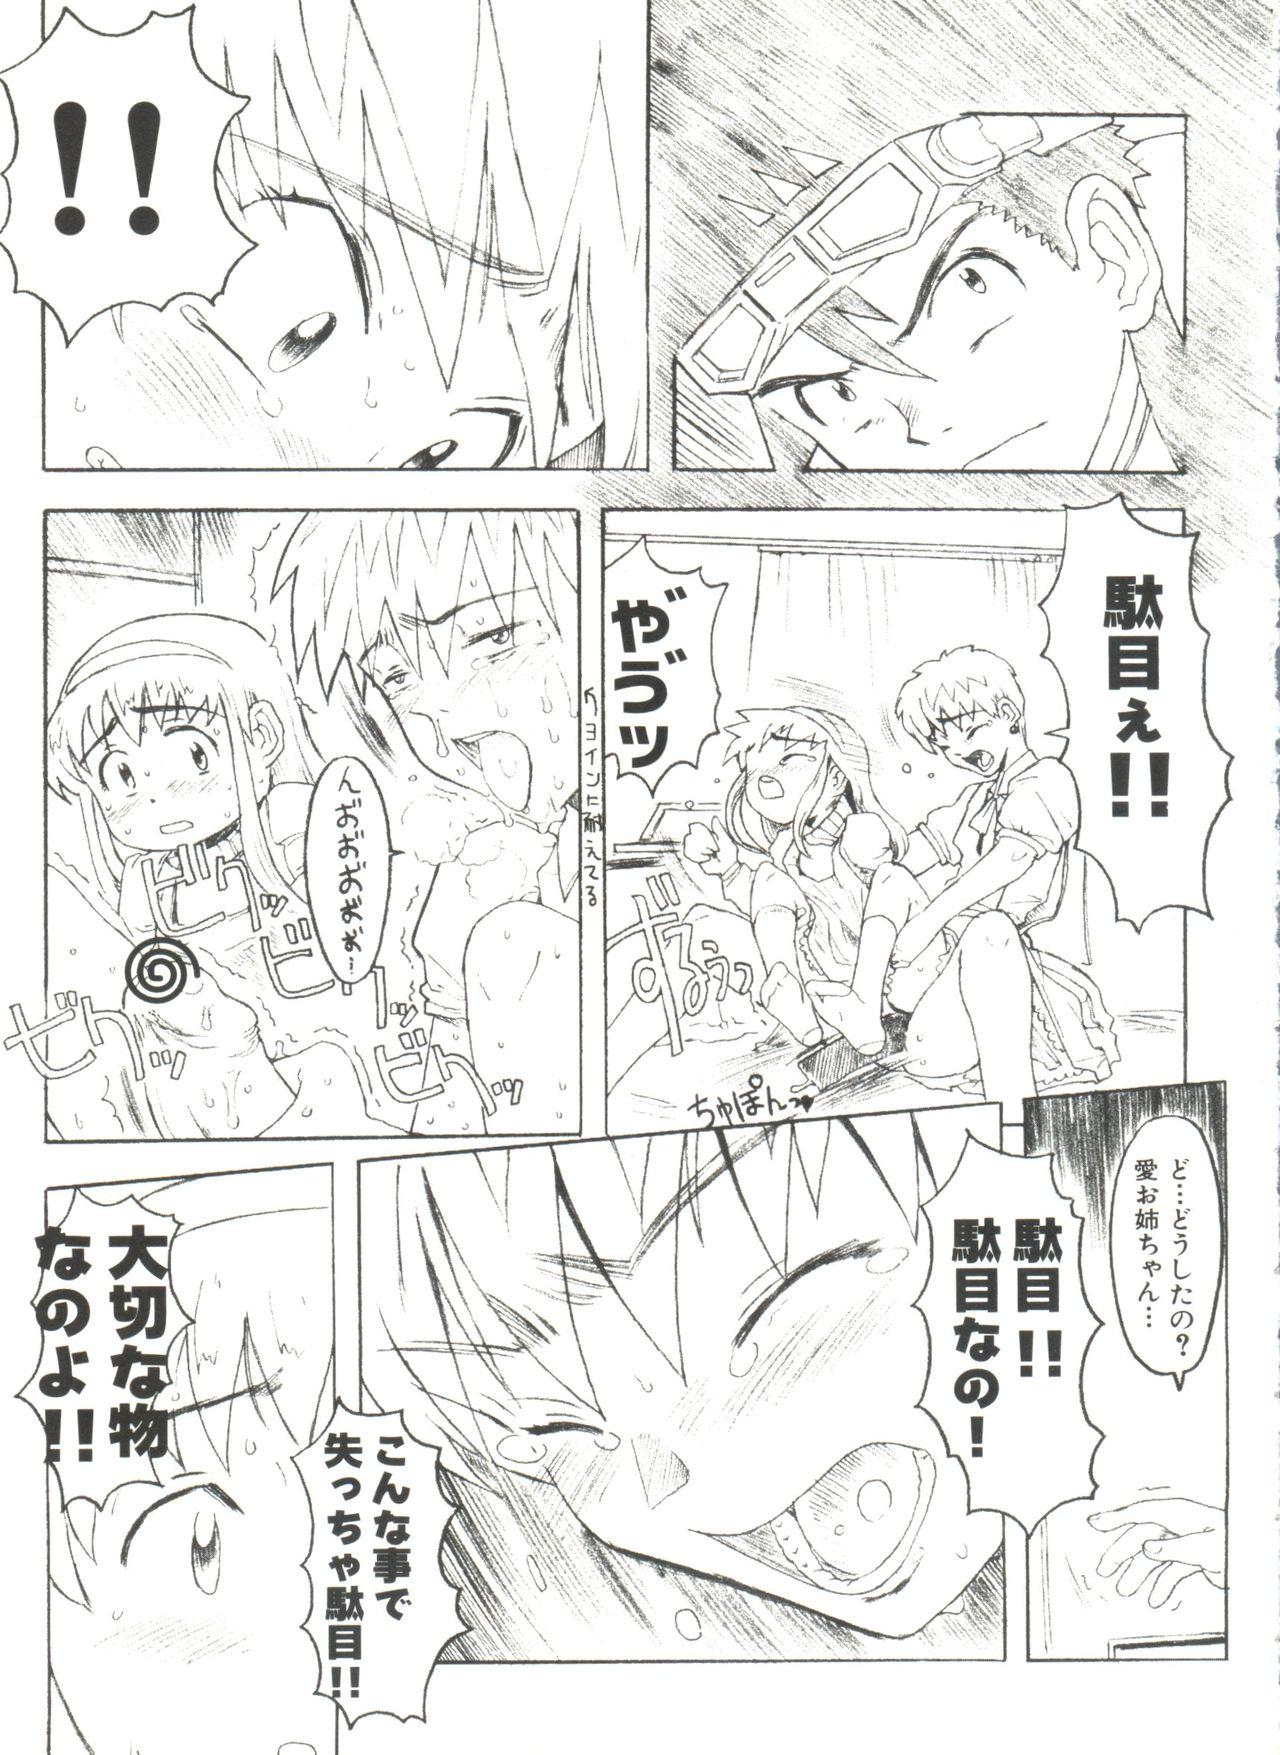 [Anthology] Denei Tamatebako 8 - Utakata no Tenshi-tachi II (Various) 78